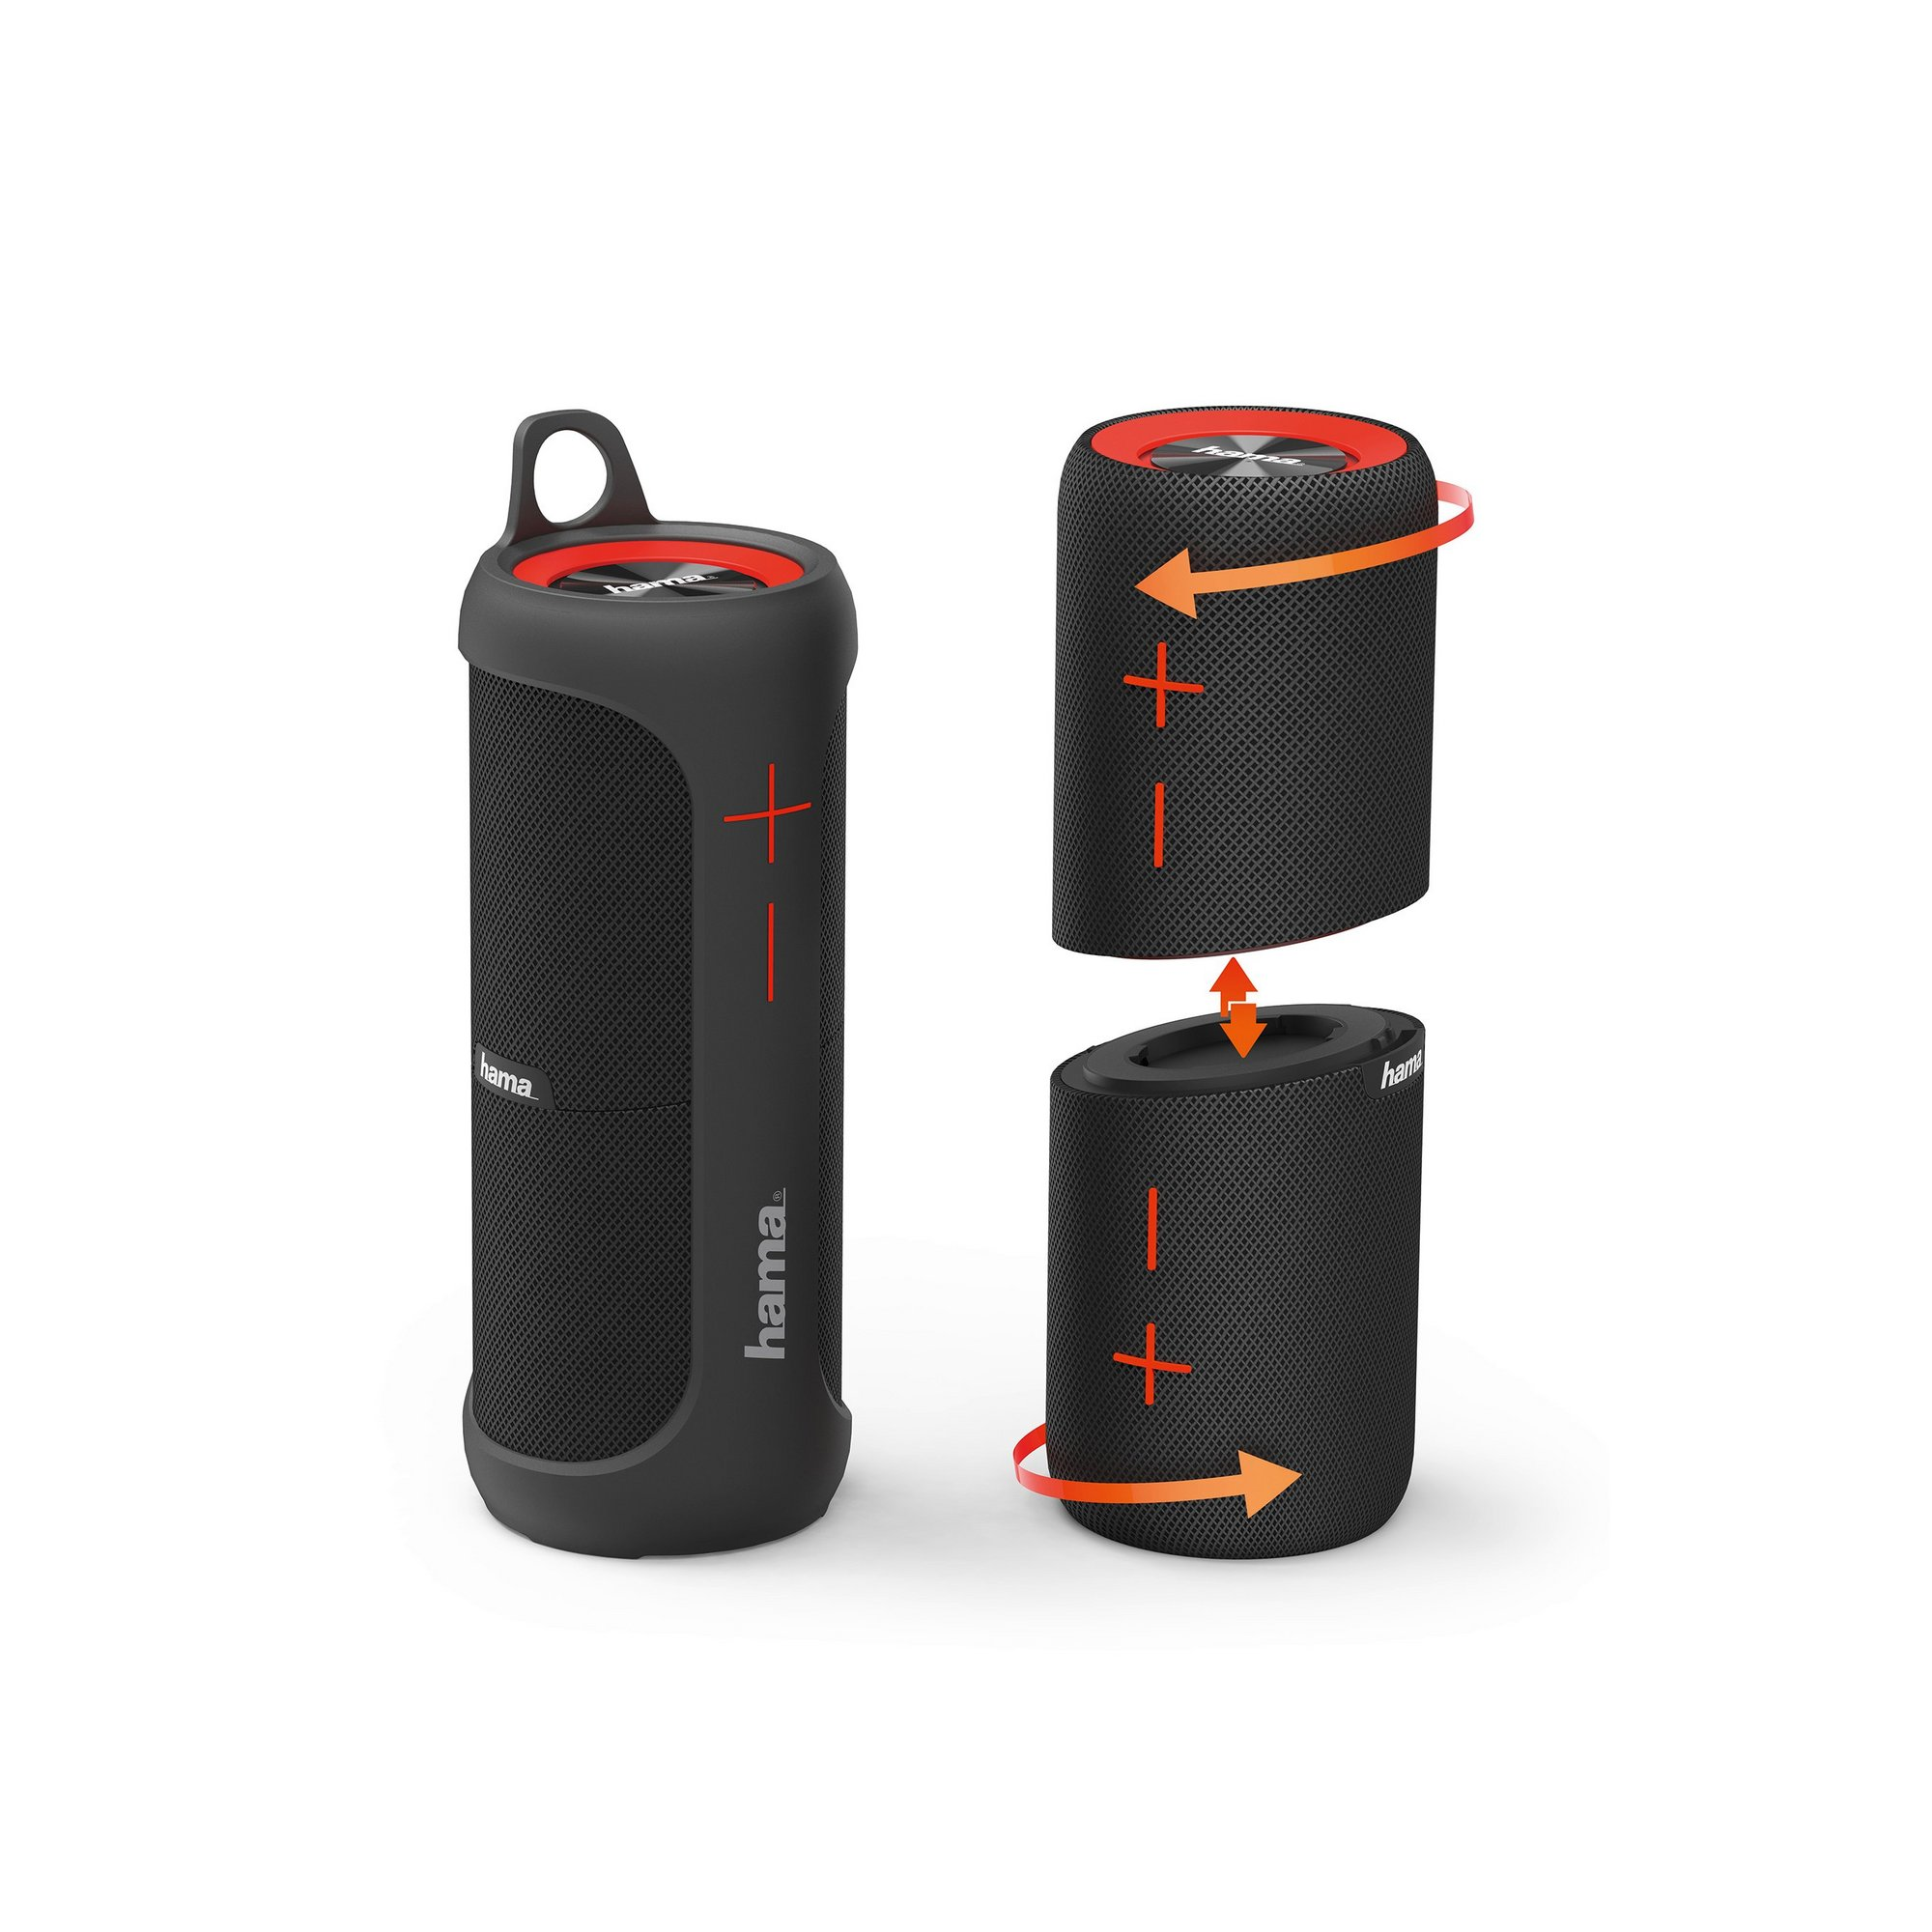 Image of Hama Soundcup-D Mobile Bluetooth Speaker